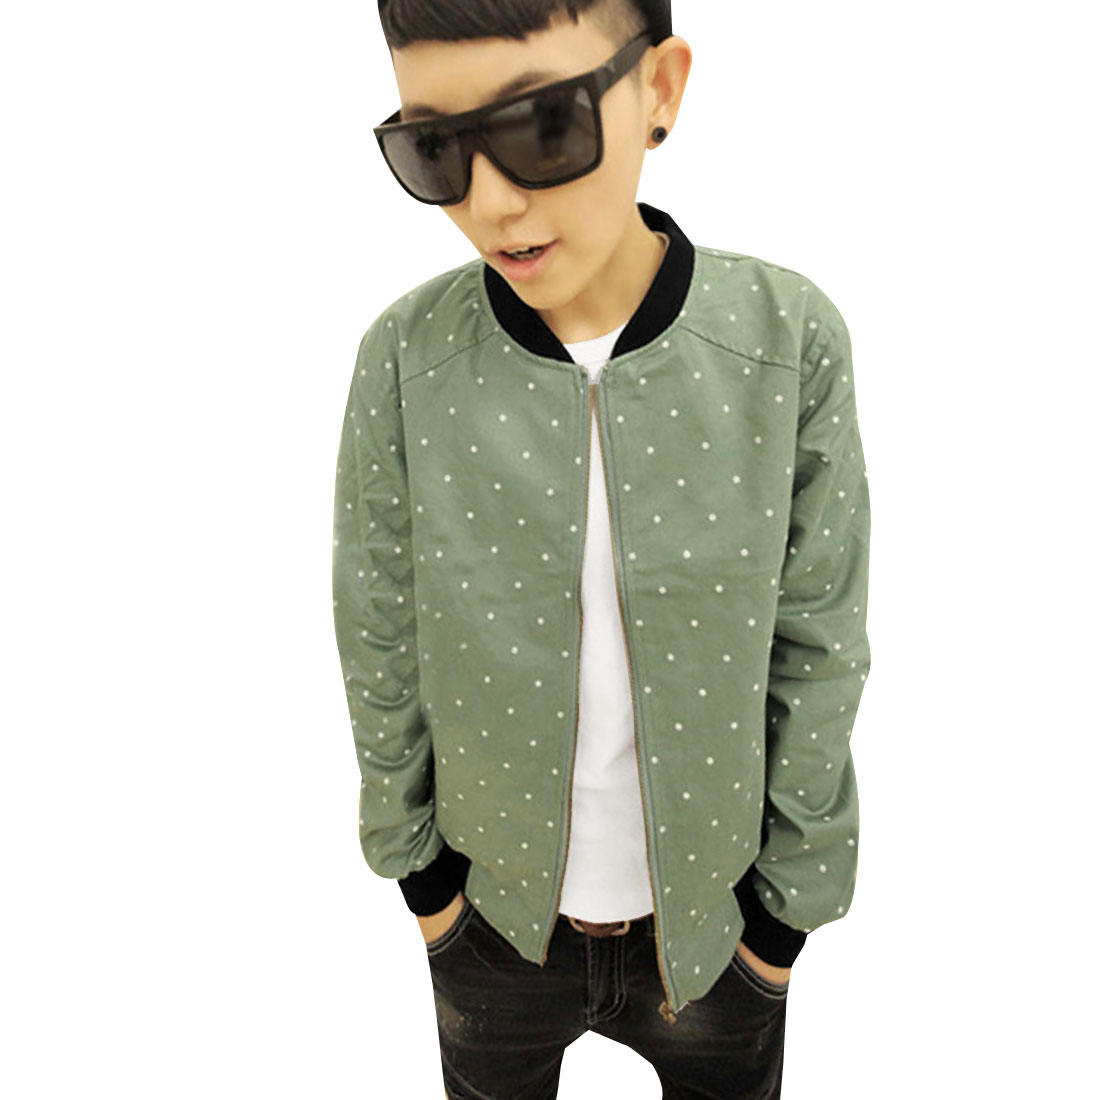 Men Pale Green Fashion Dots Pattern Zipped Closure Slant Pockets Autumn Jacket M